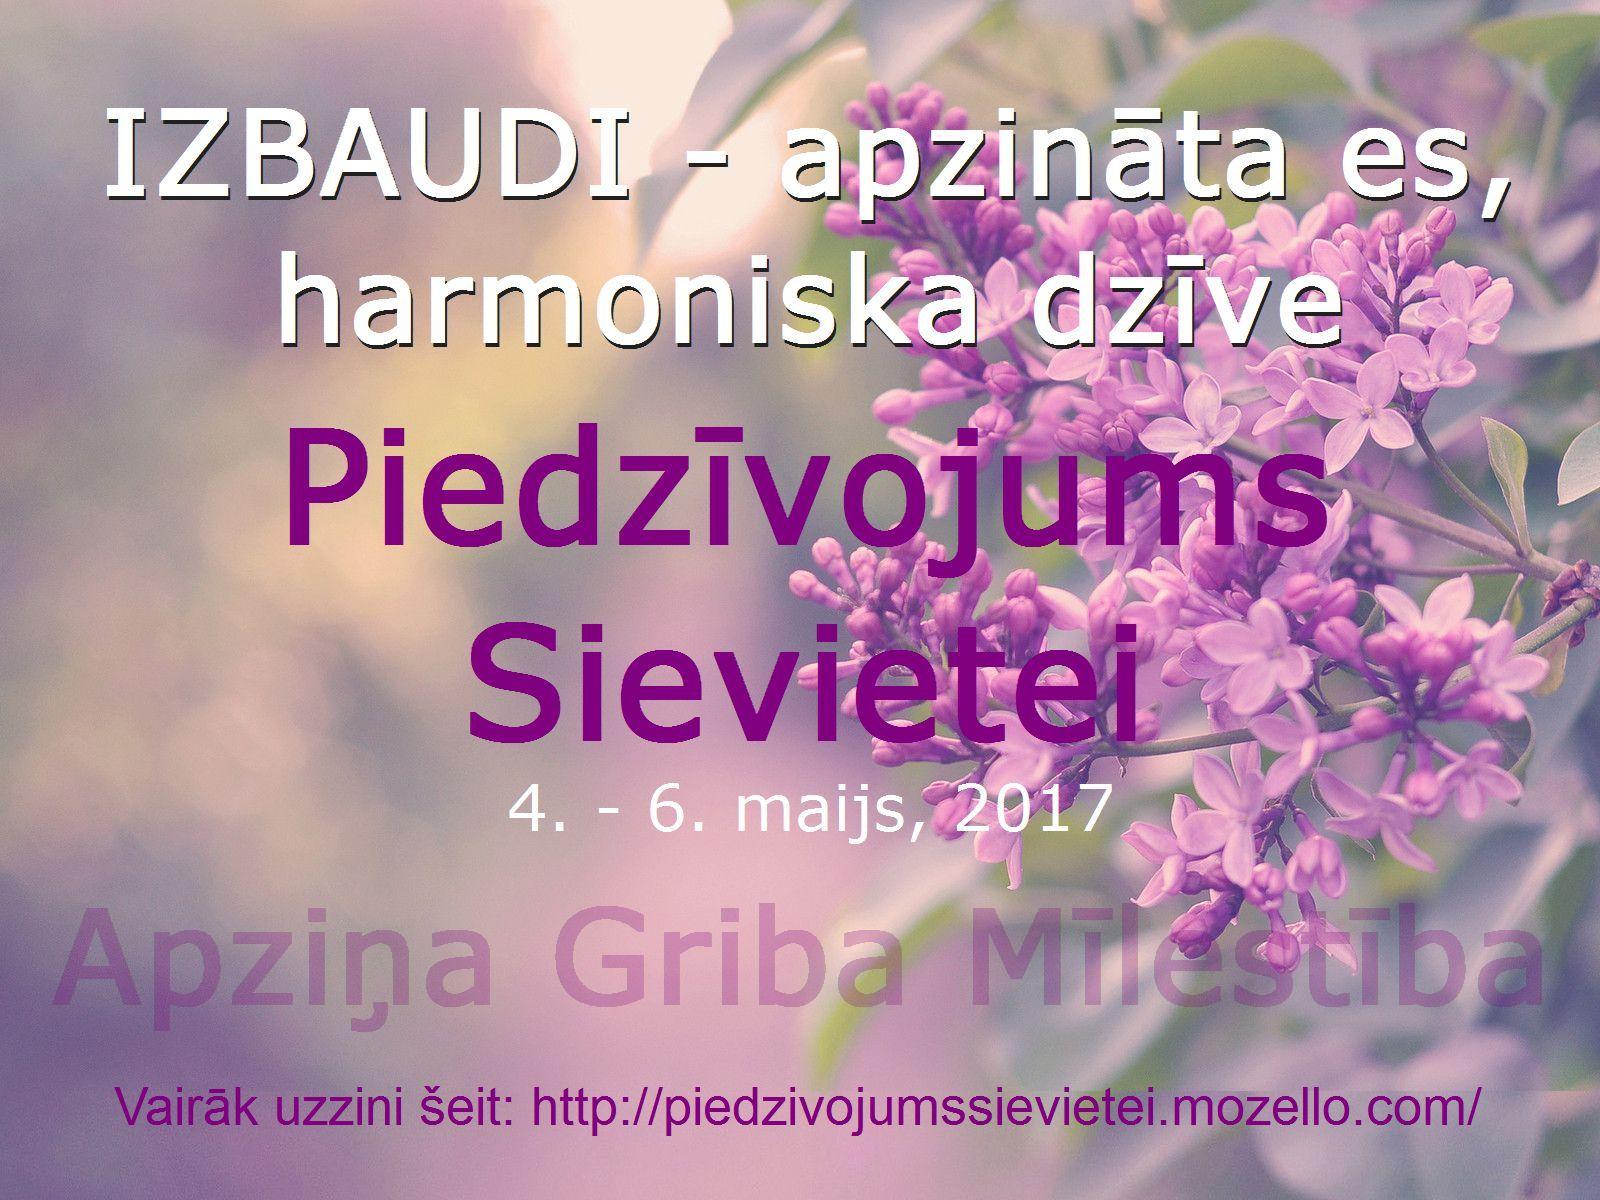 http://www.kaneapeststresu.com/2017/02/izbaudi-apzinata-es-harmoniska-dzive.html